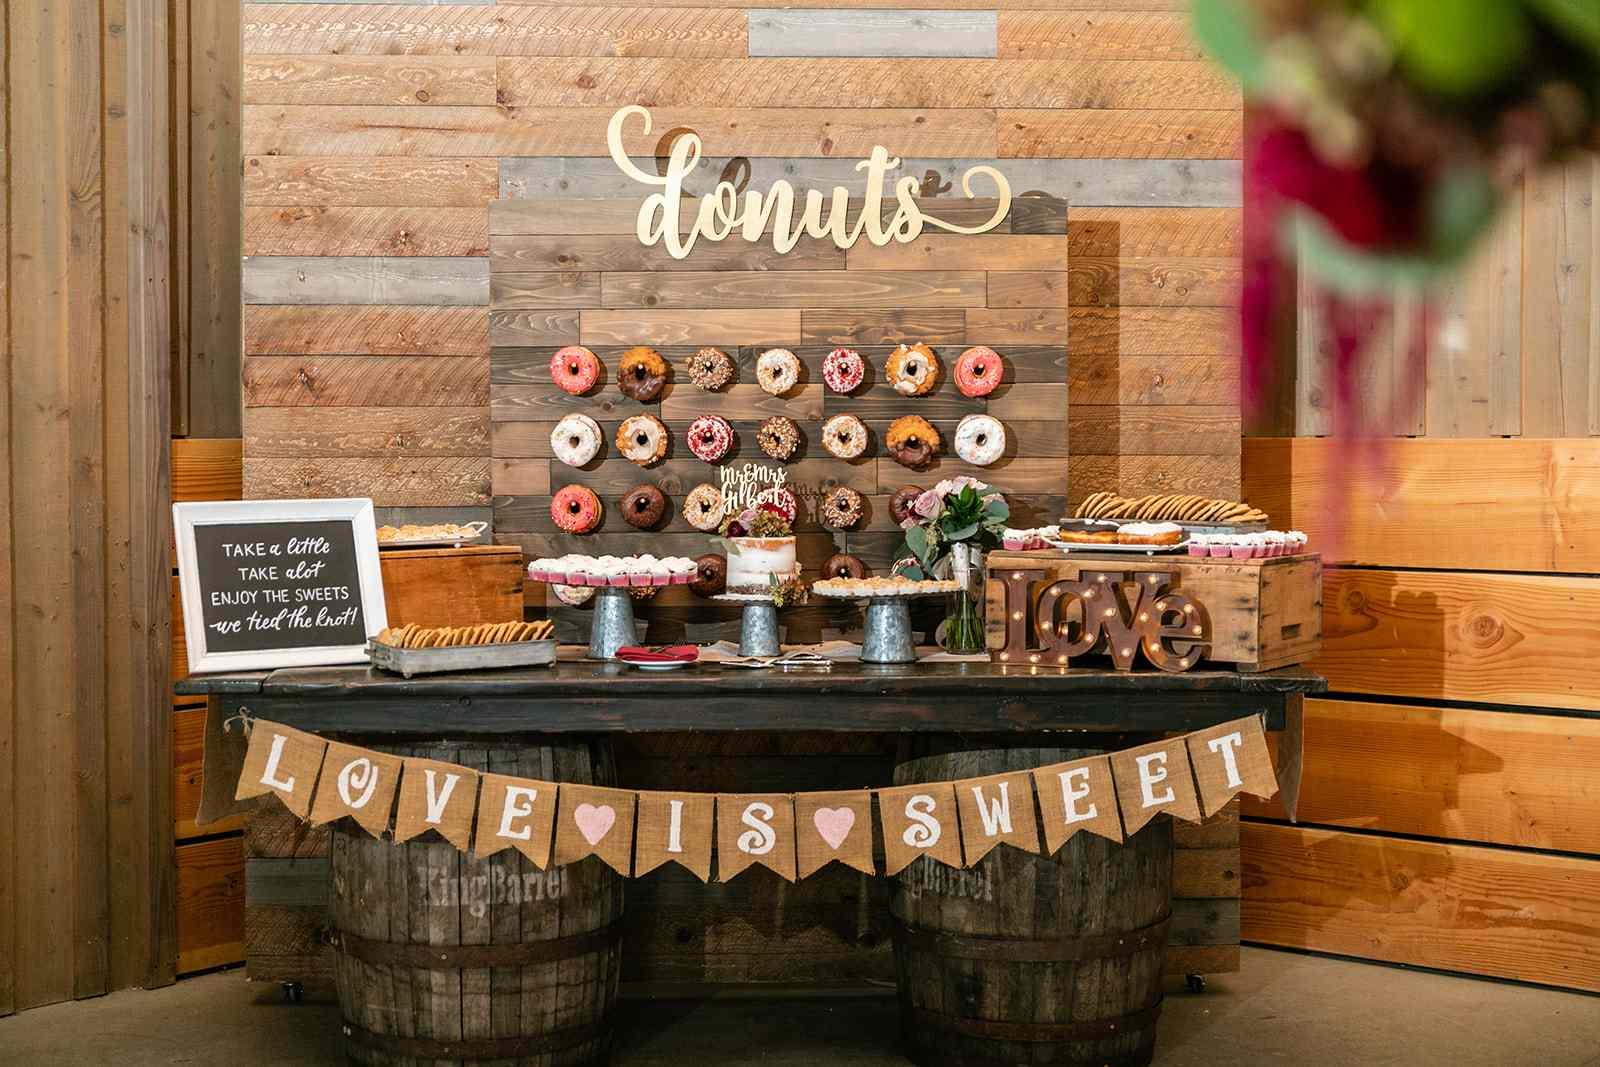 Shabby-Chic Doughnut Wall With Wine Barrels